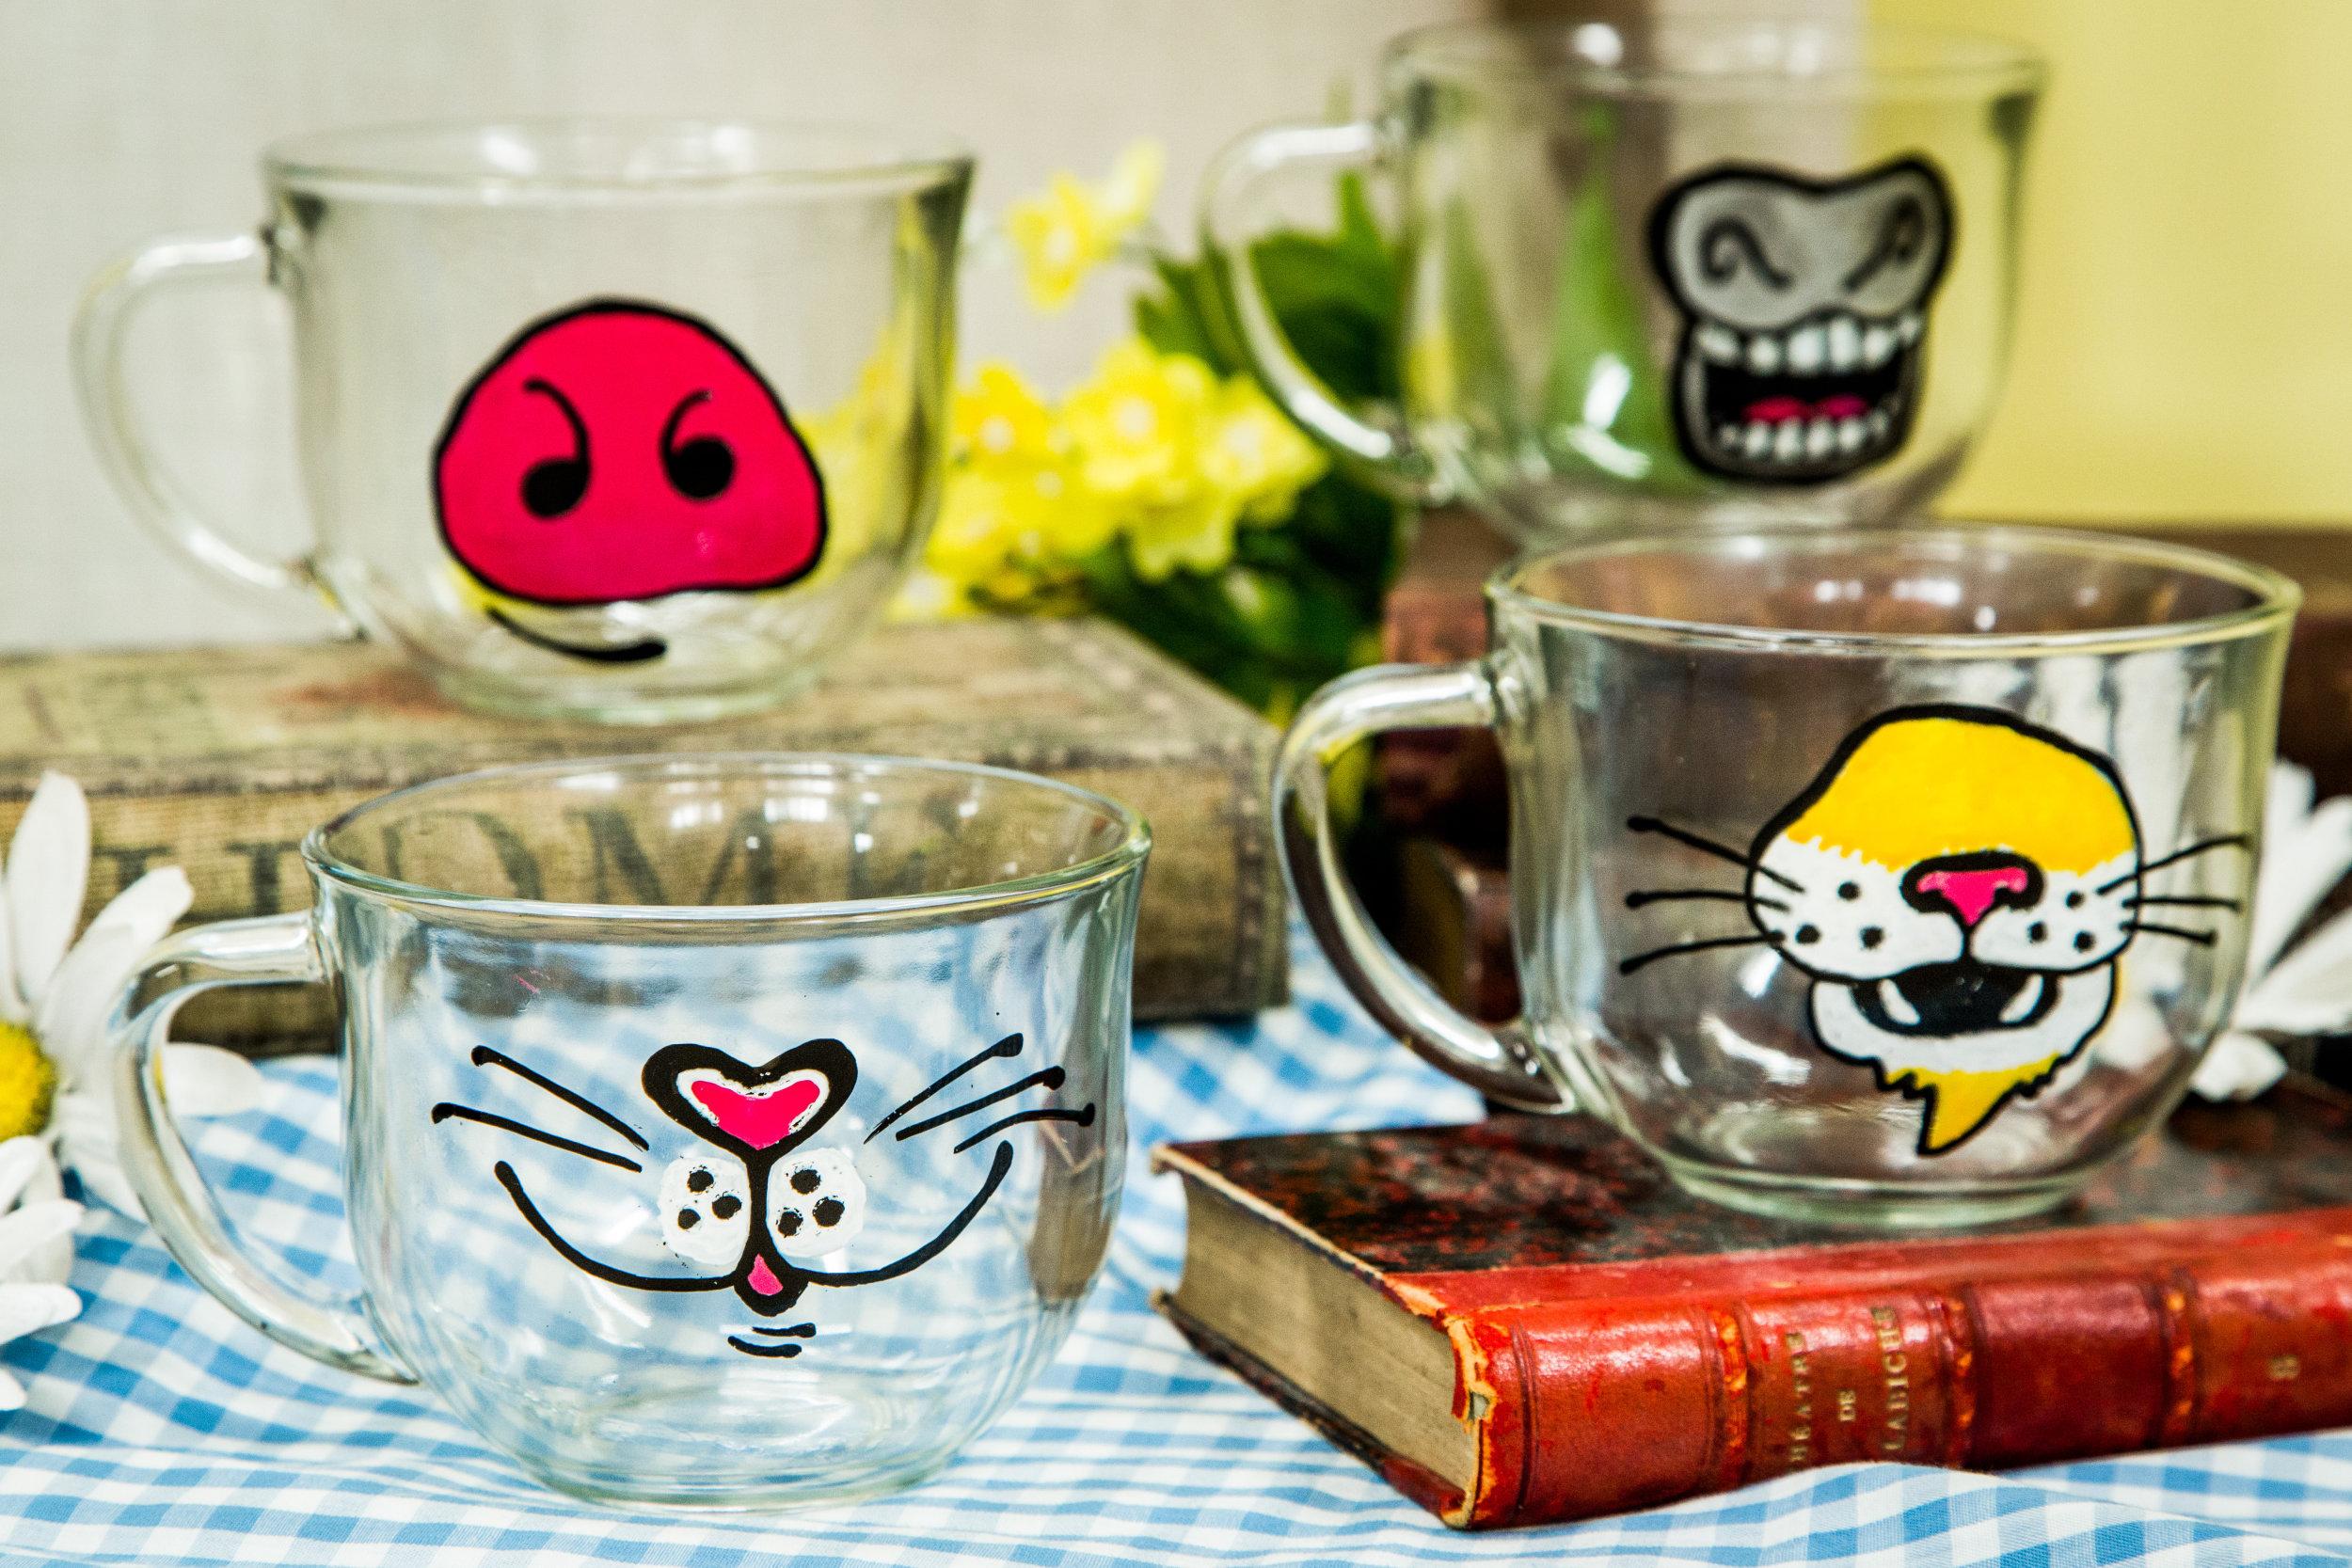 How to diy animal face mugs home family hallmark for Animal face mugs